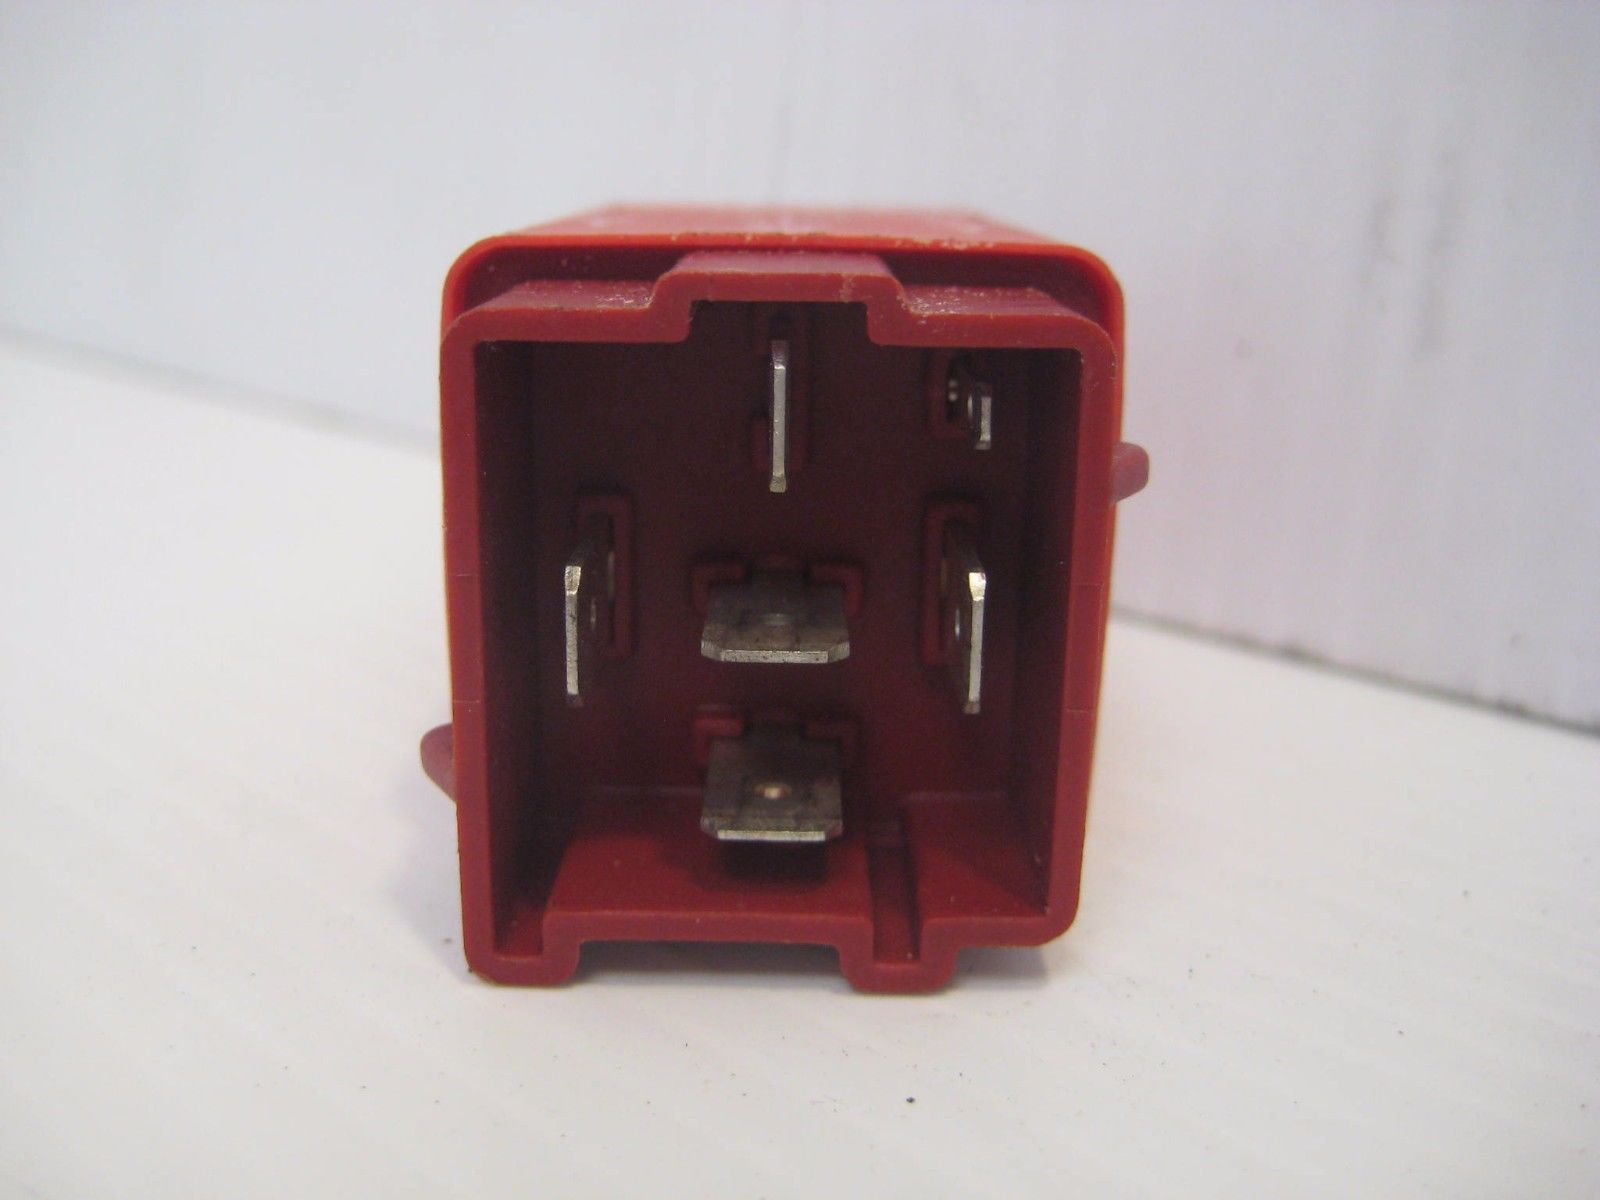 Volvo 850 Turbo 1994 Relay Intermittent Wiper Control 9140663 OEM